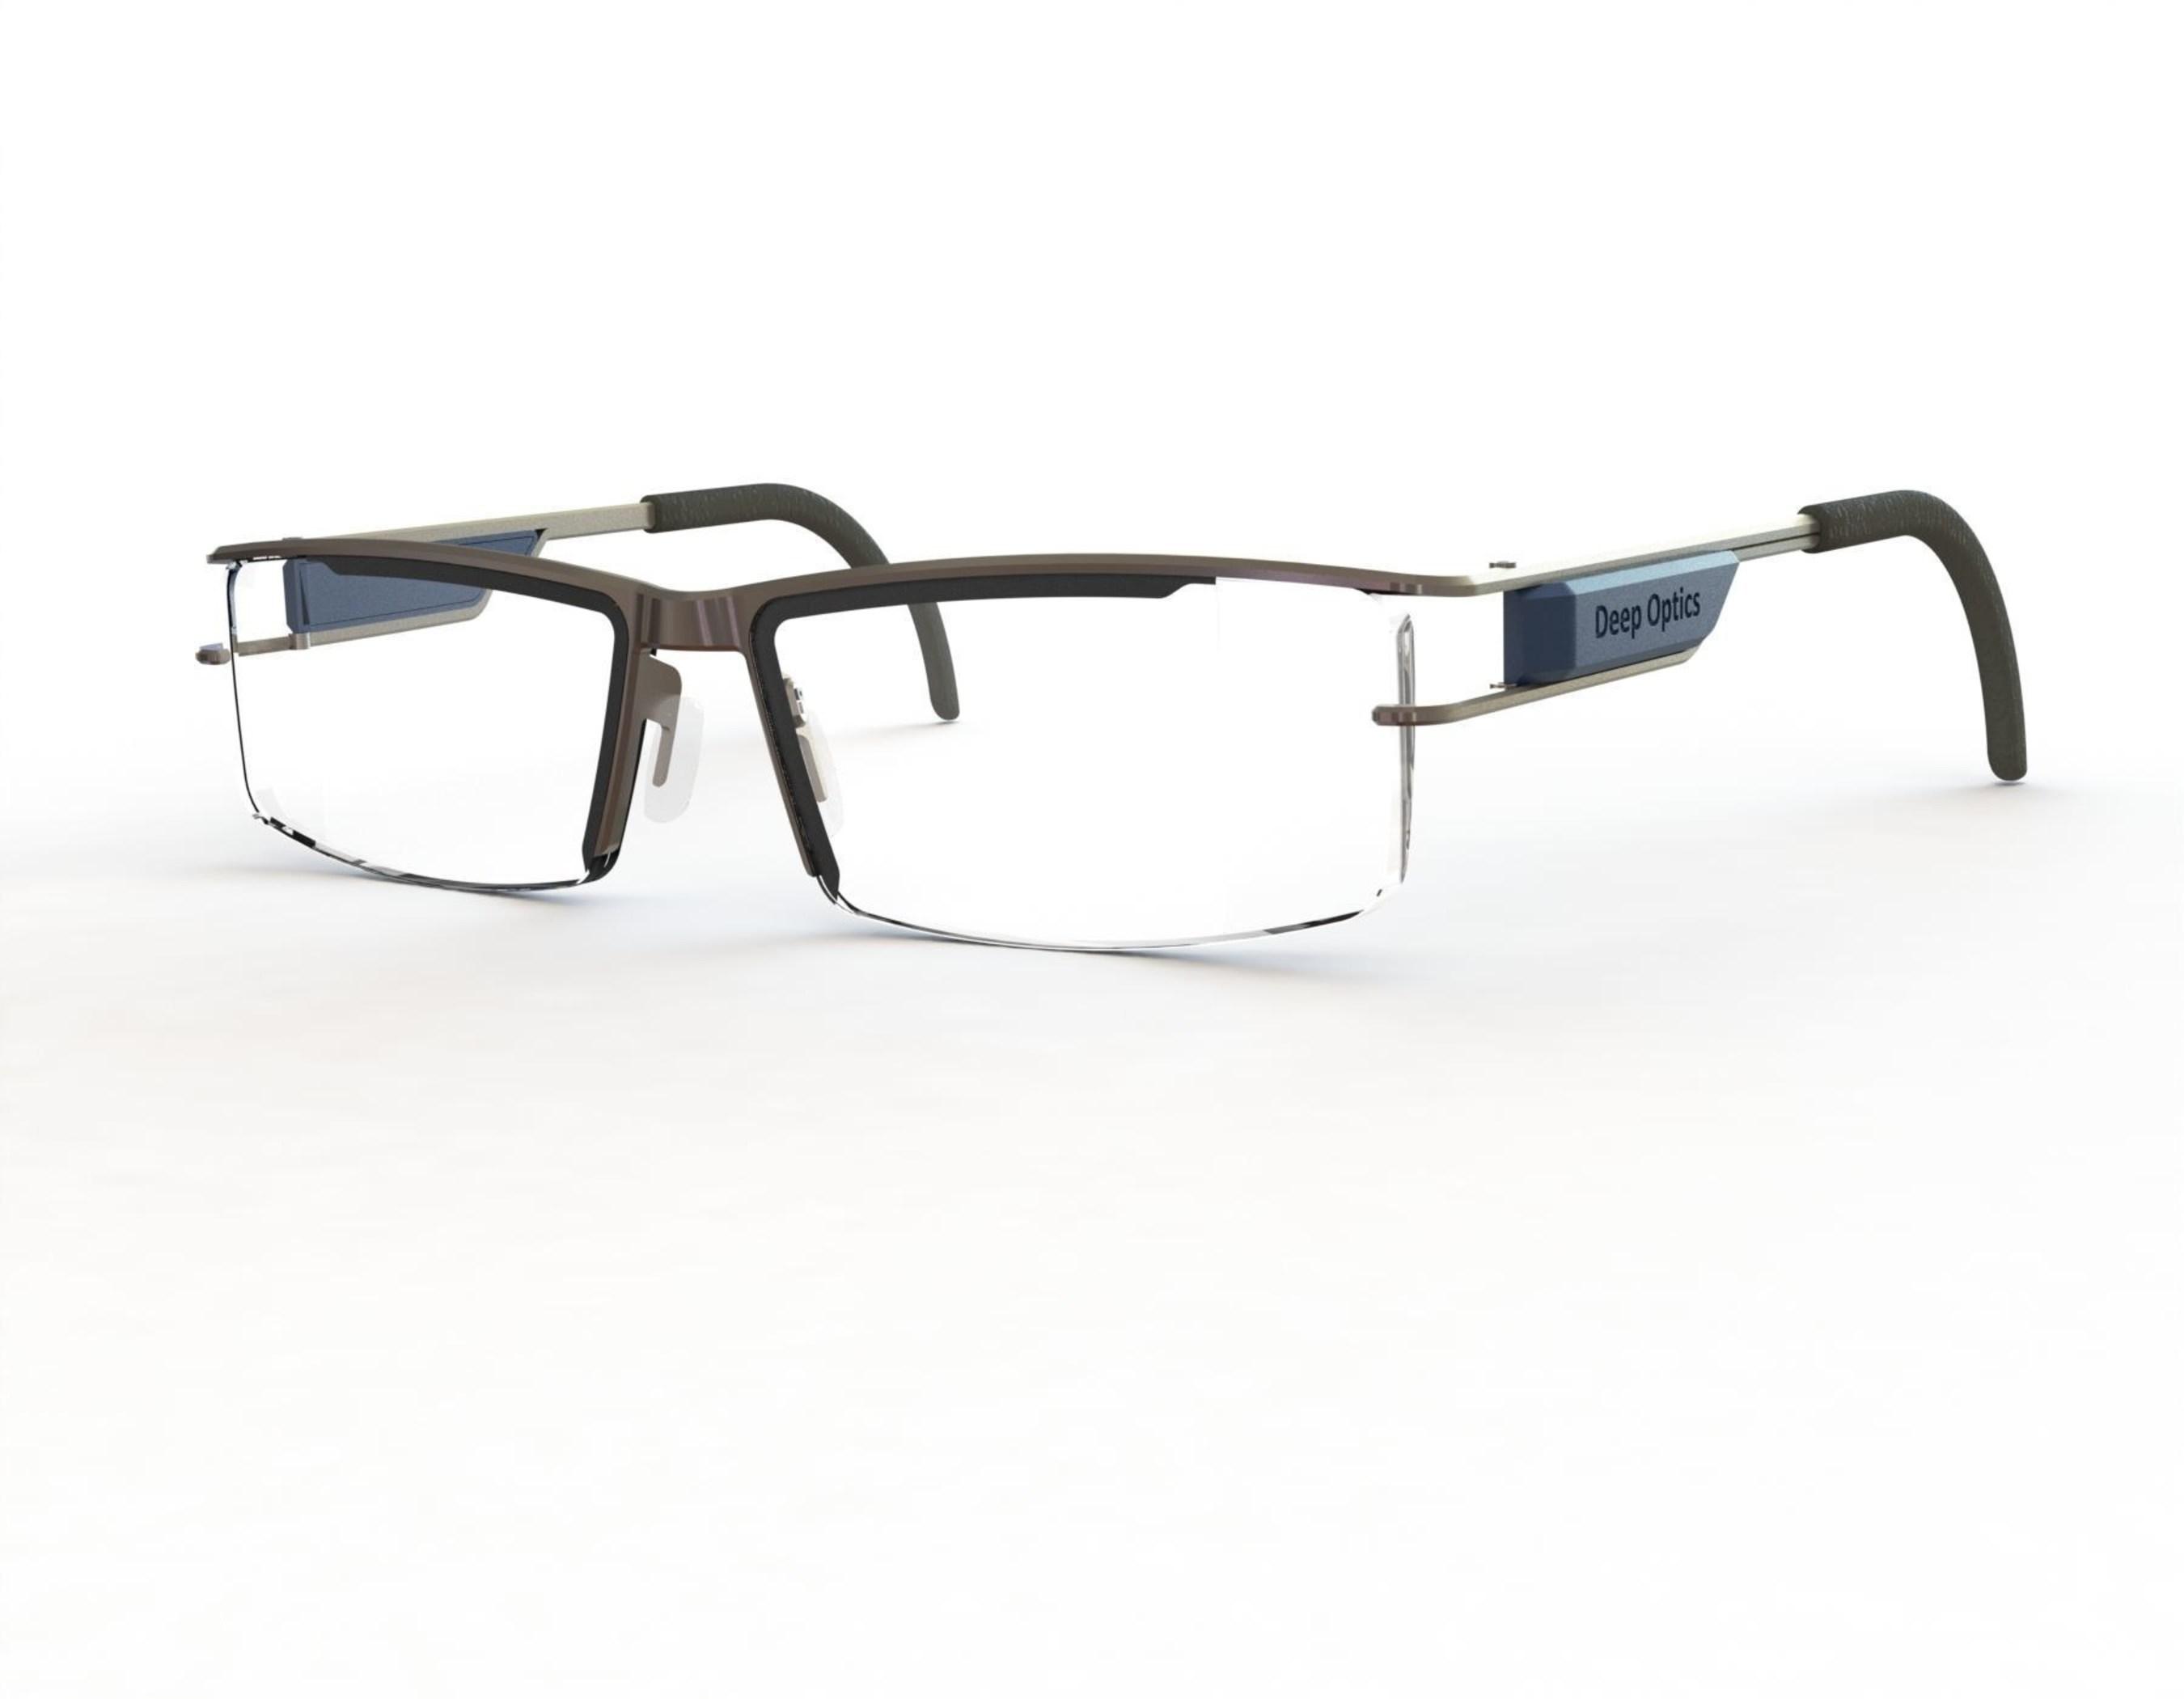 Deep Optics Omnifocals - concept design